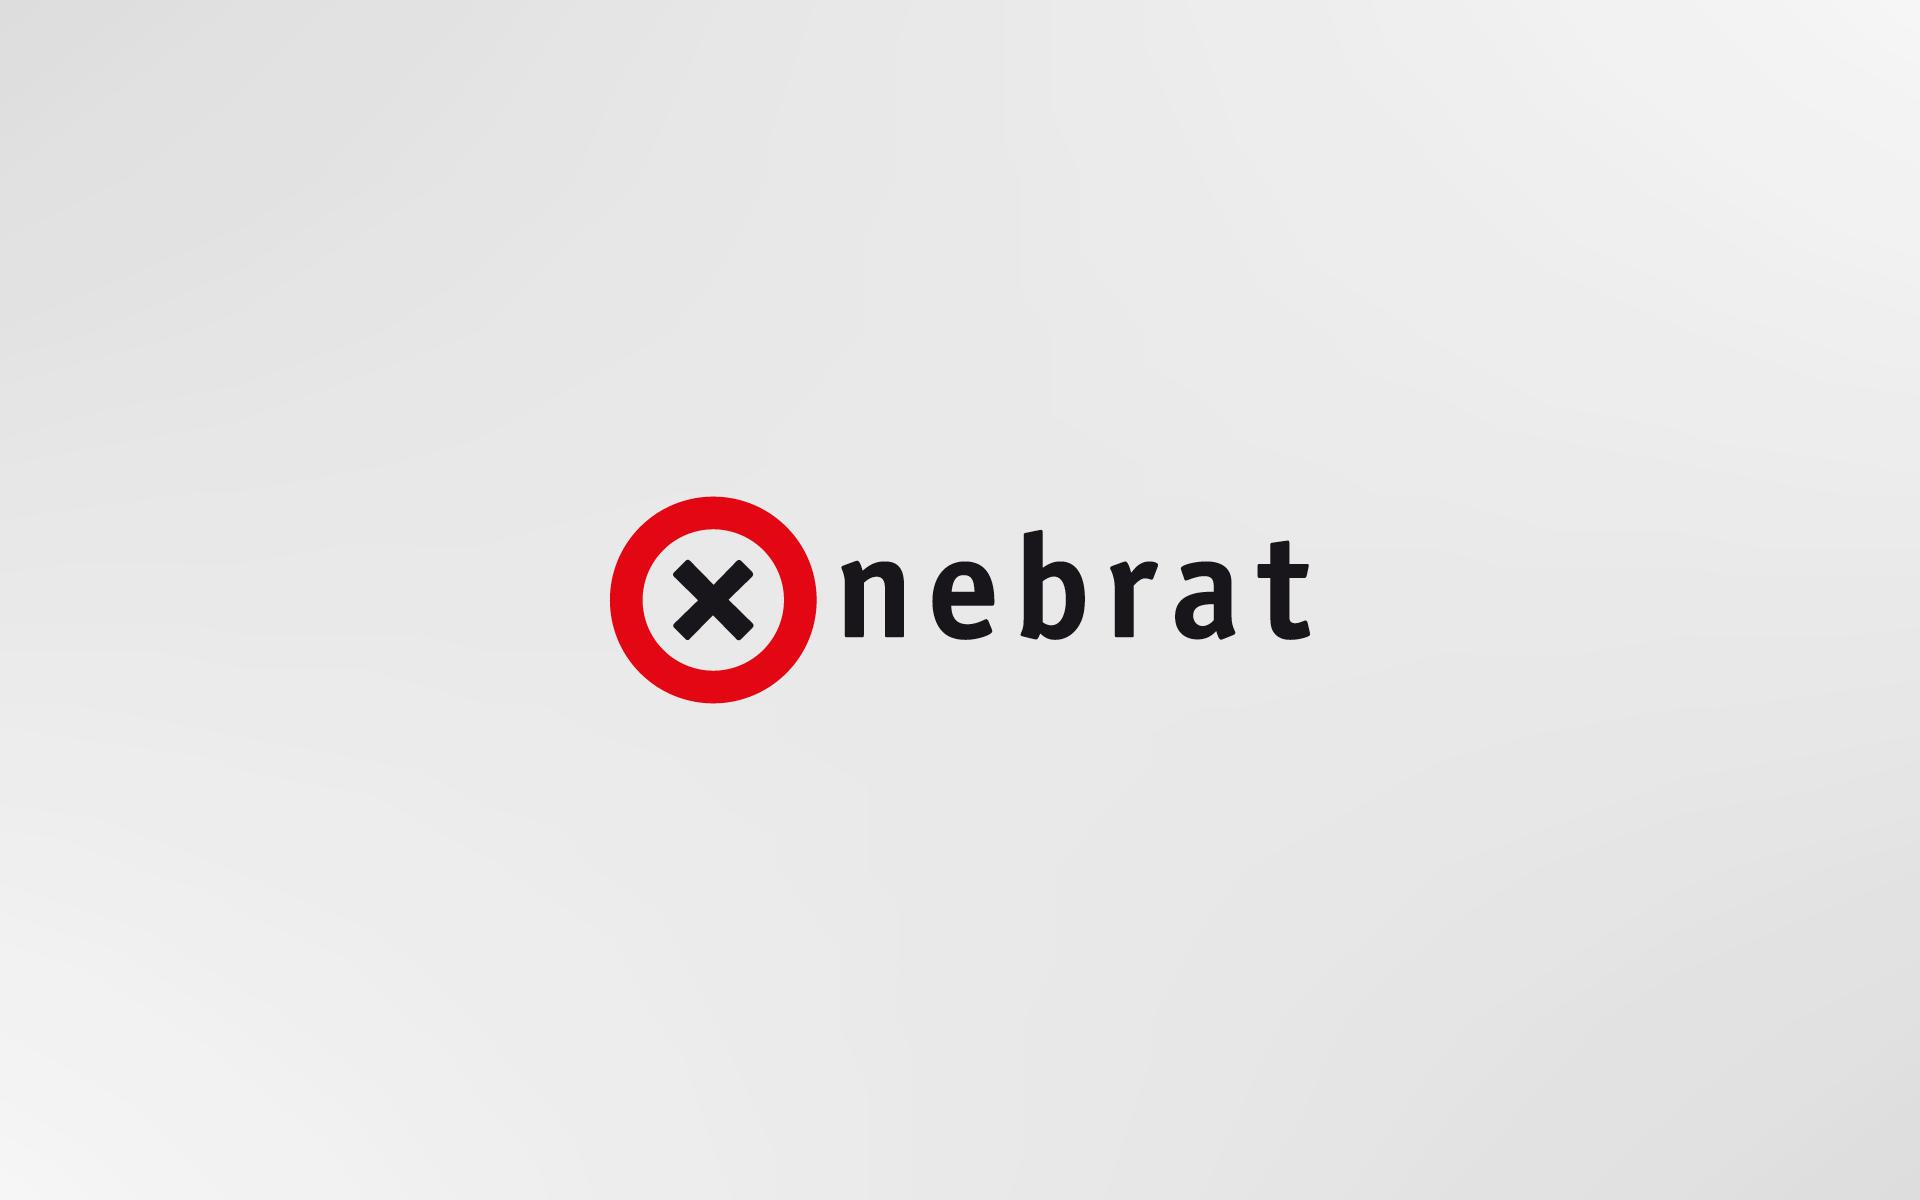 2003-Nebrat-logo